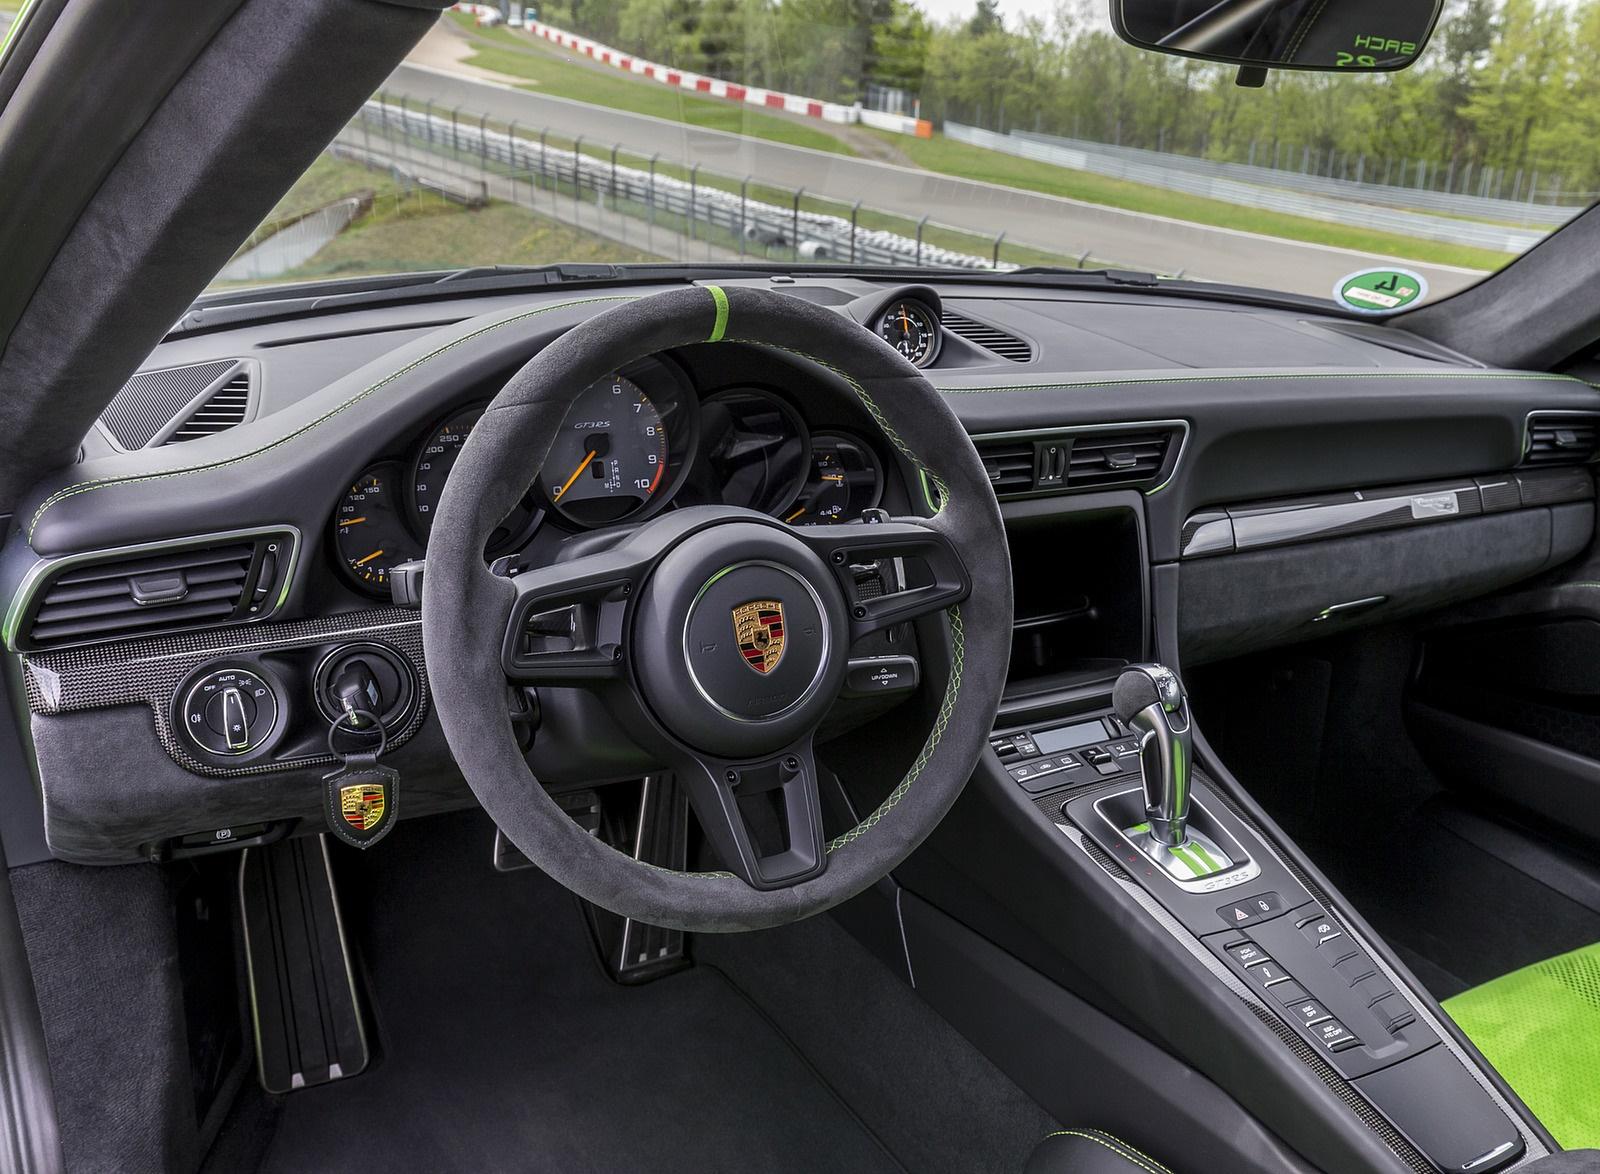 2019 Porsche 911 Gt3 Rs Weissach Package Color Lizard Green Interior Wallpapers 195 Newcarcars